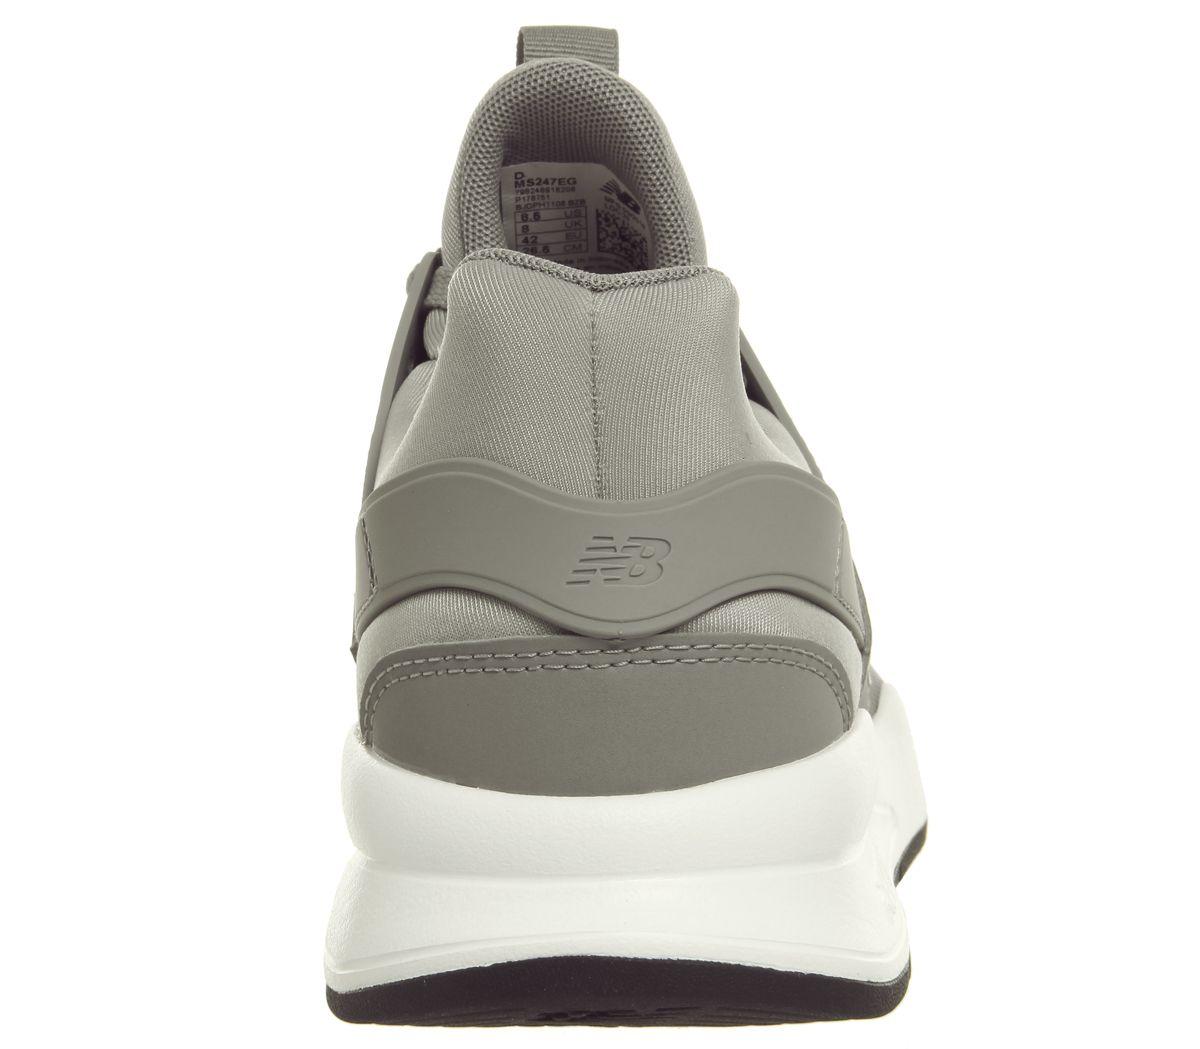 New-Balance-247V2-Baskets-Marblehead-Baskets-Chaussures miniature 8